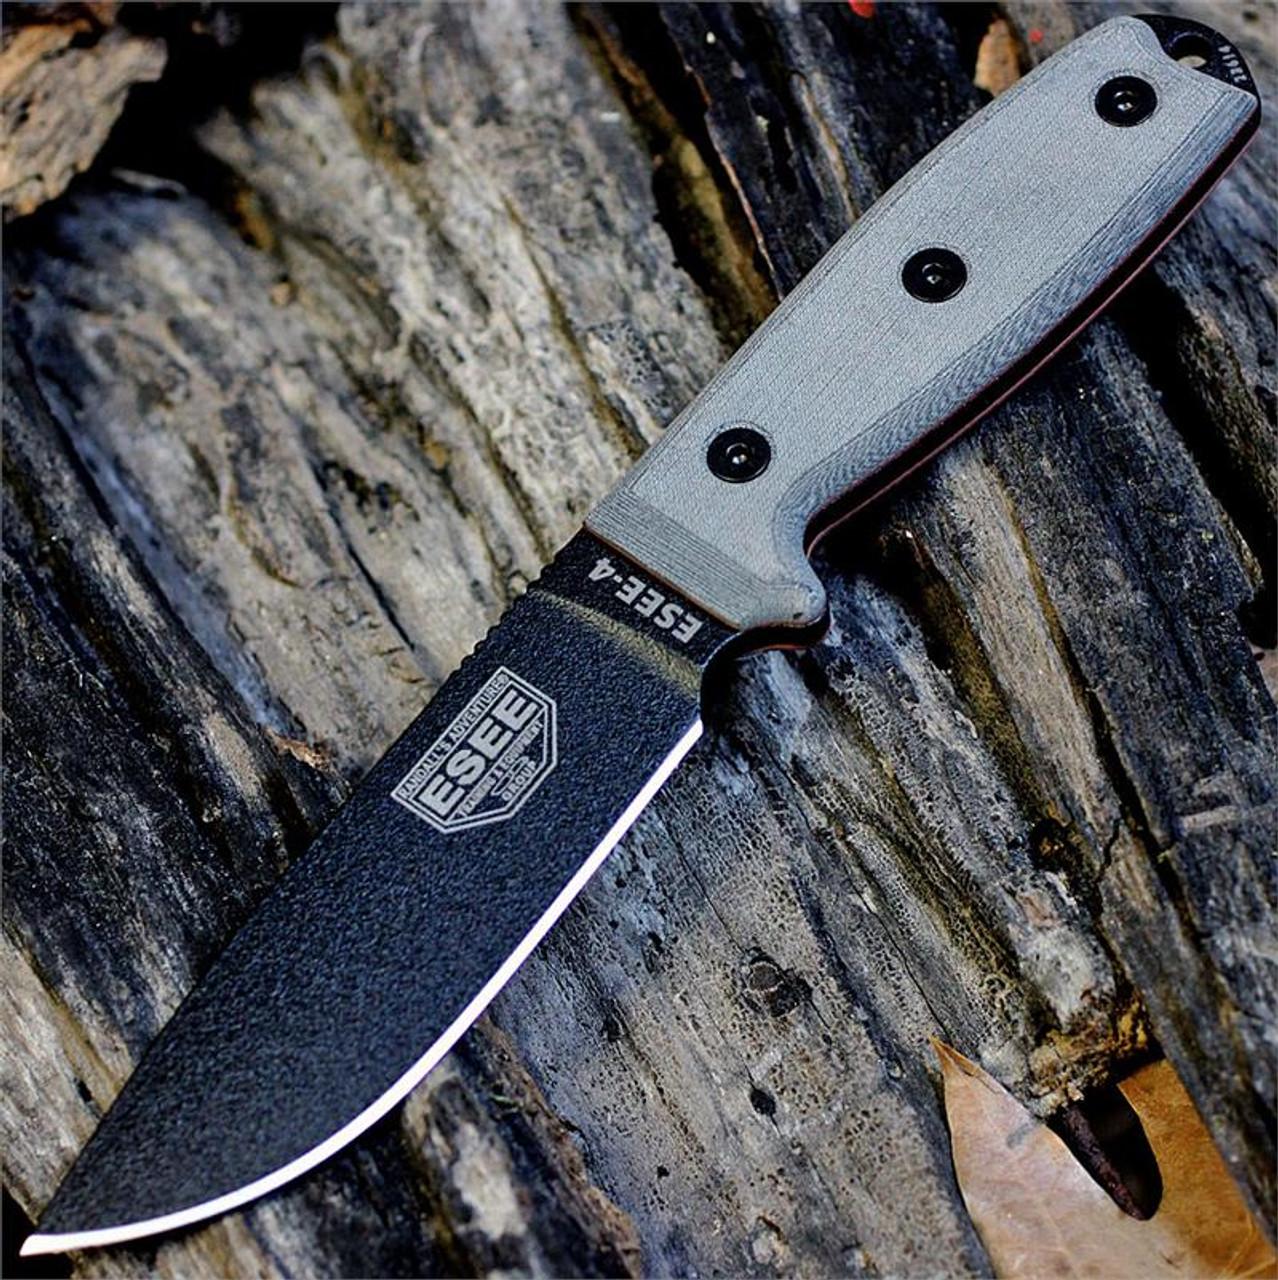 ESEE Knives, 4P-B, Black Blade, Plain Edge, Micarta Handle, Black Molded Sheath and Clip Plate